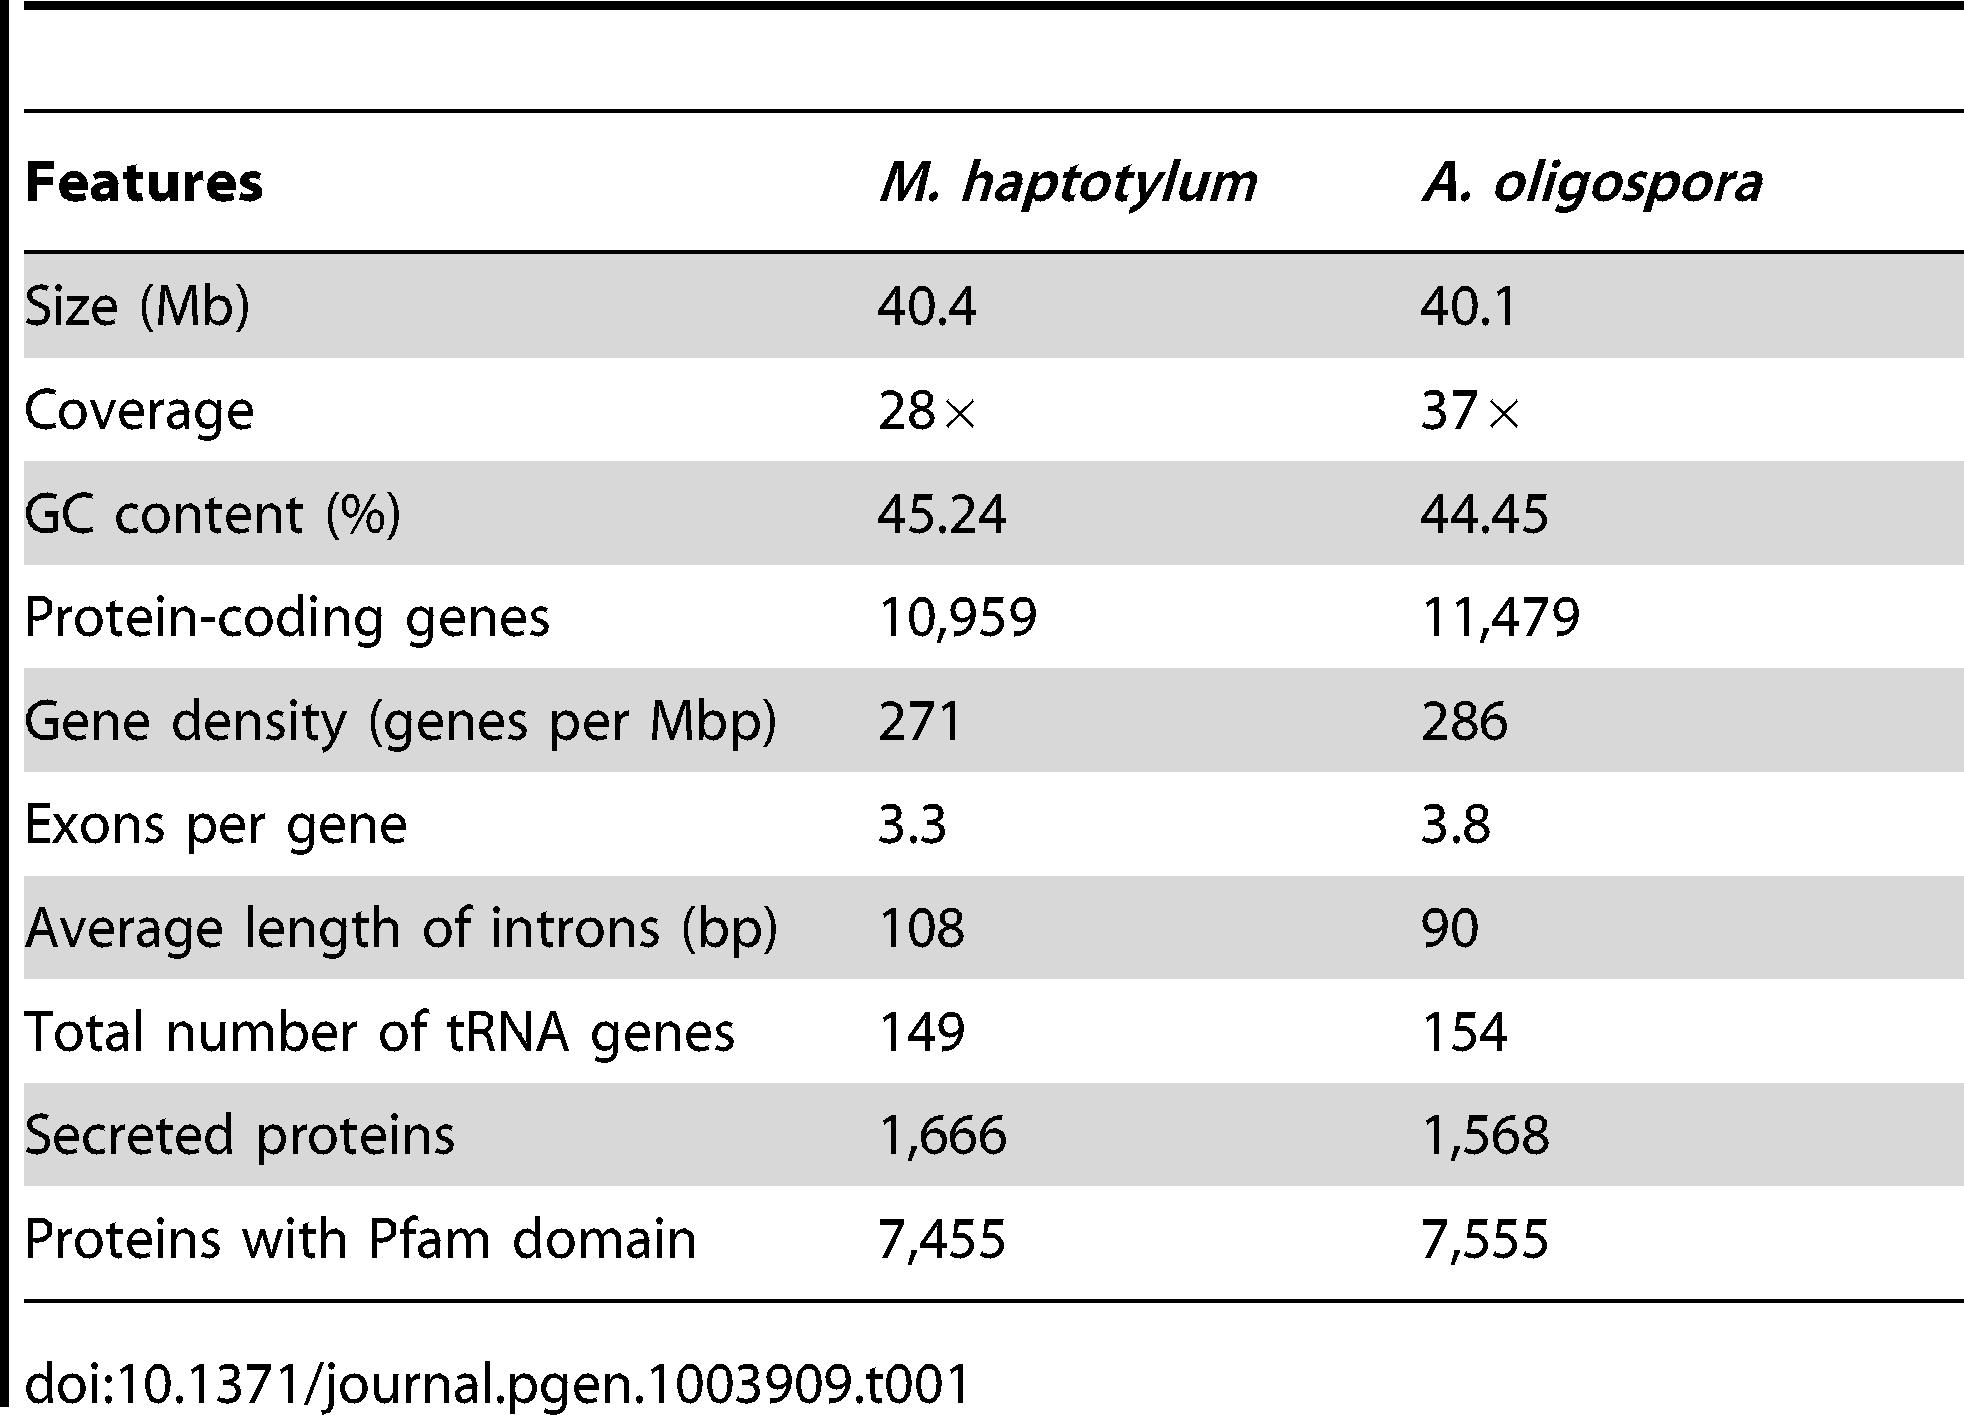 Main features of the <i>M. haptotylum</i> and <i>A. oligospora</i> genomes.